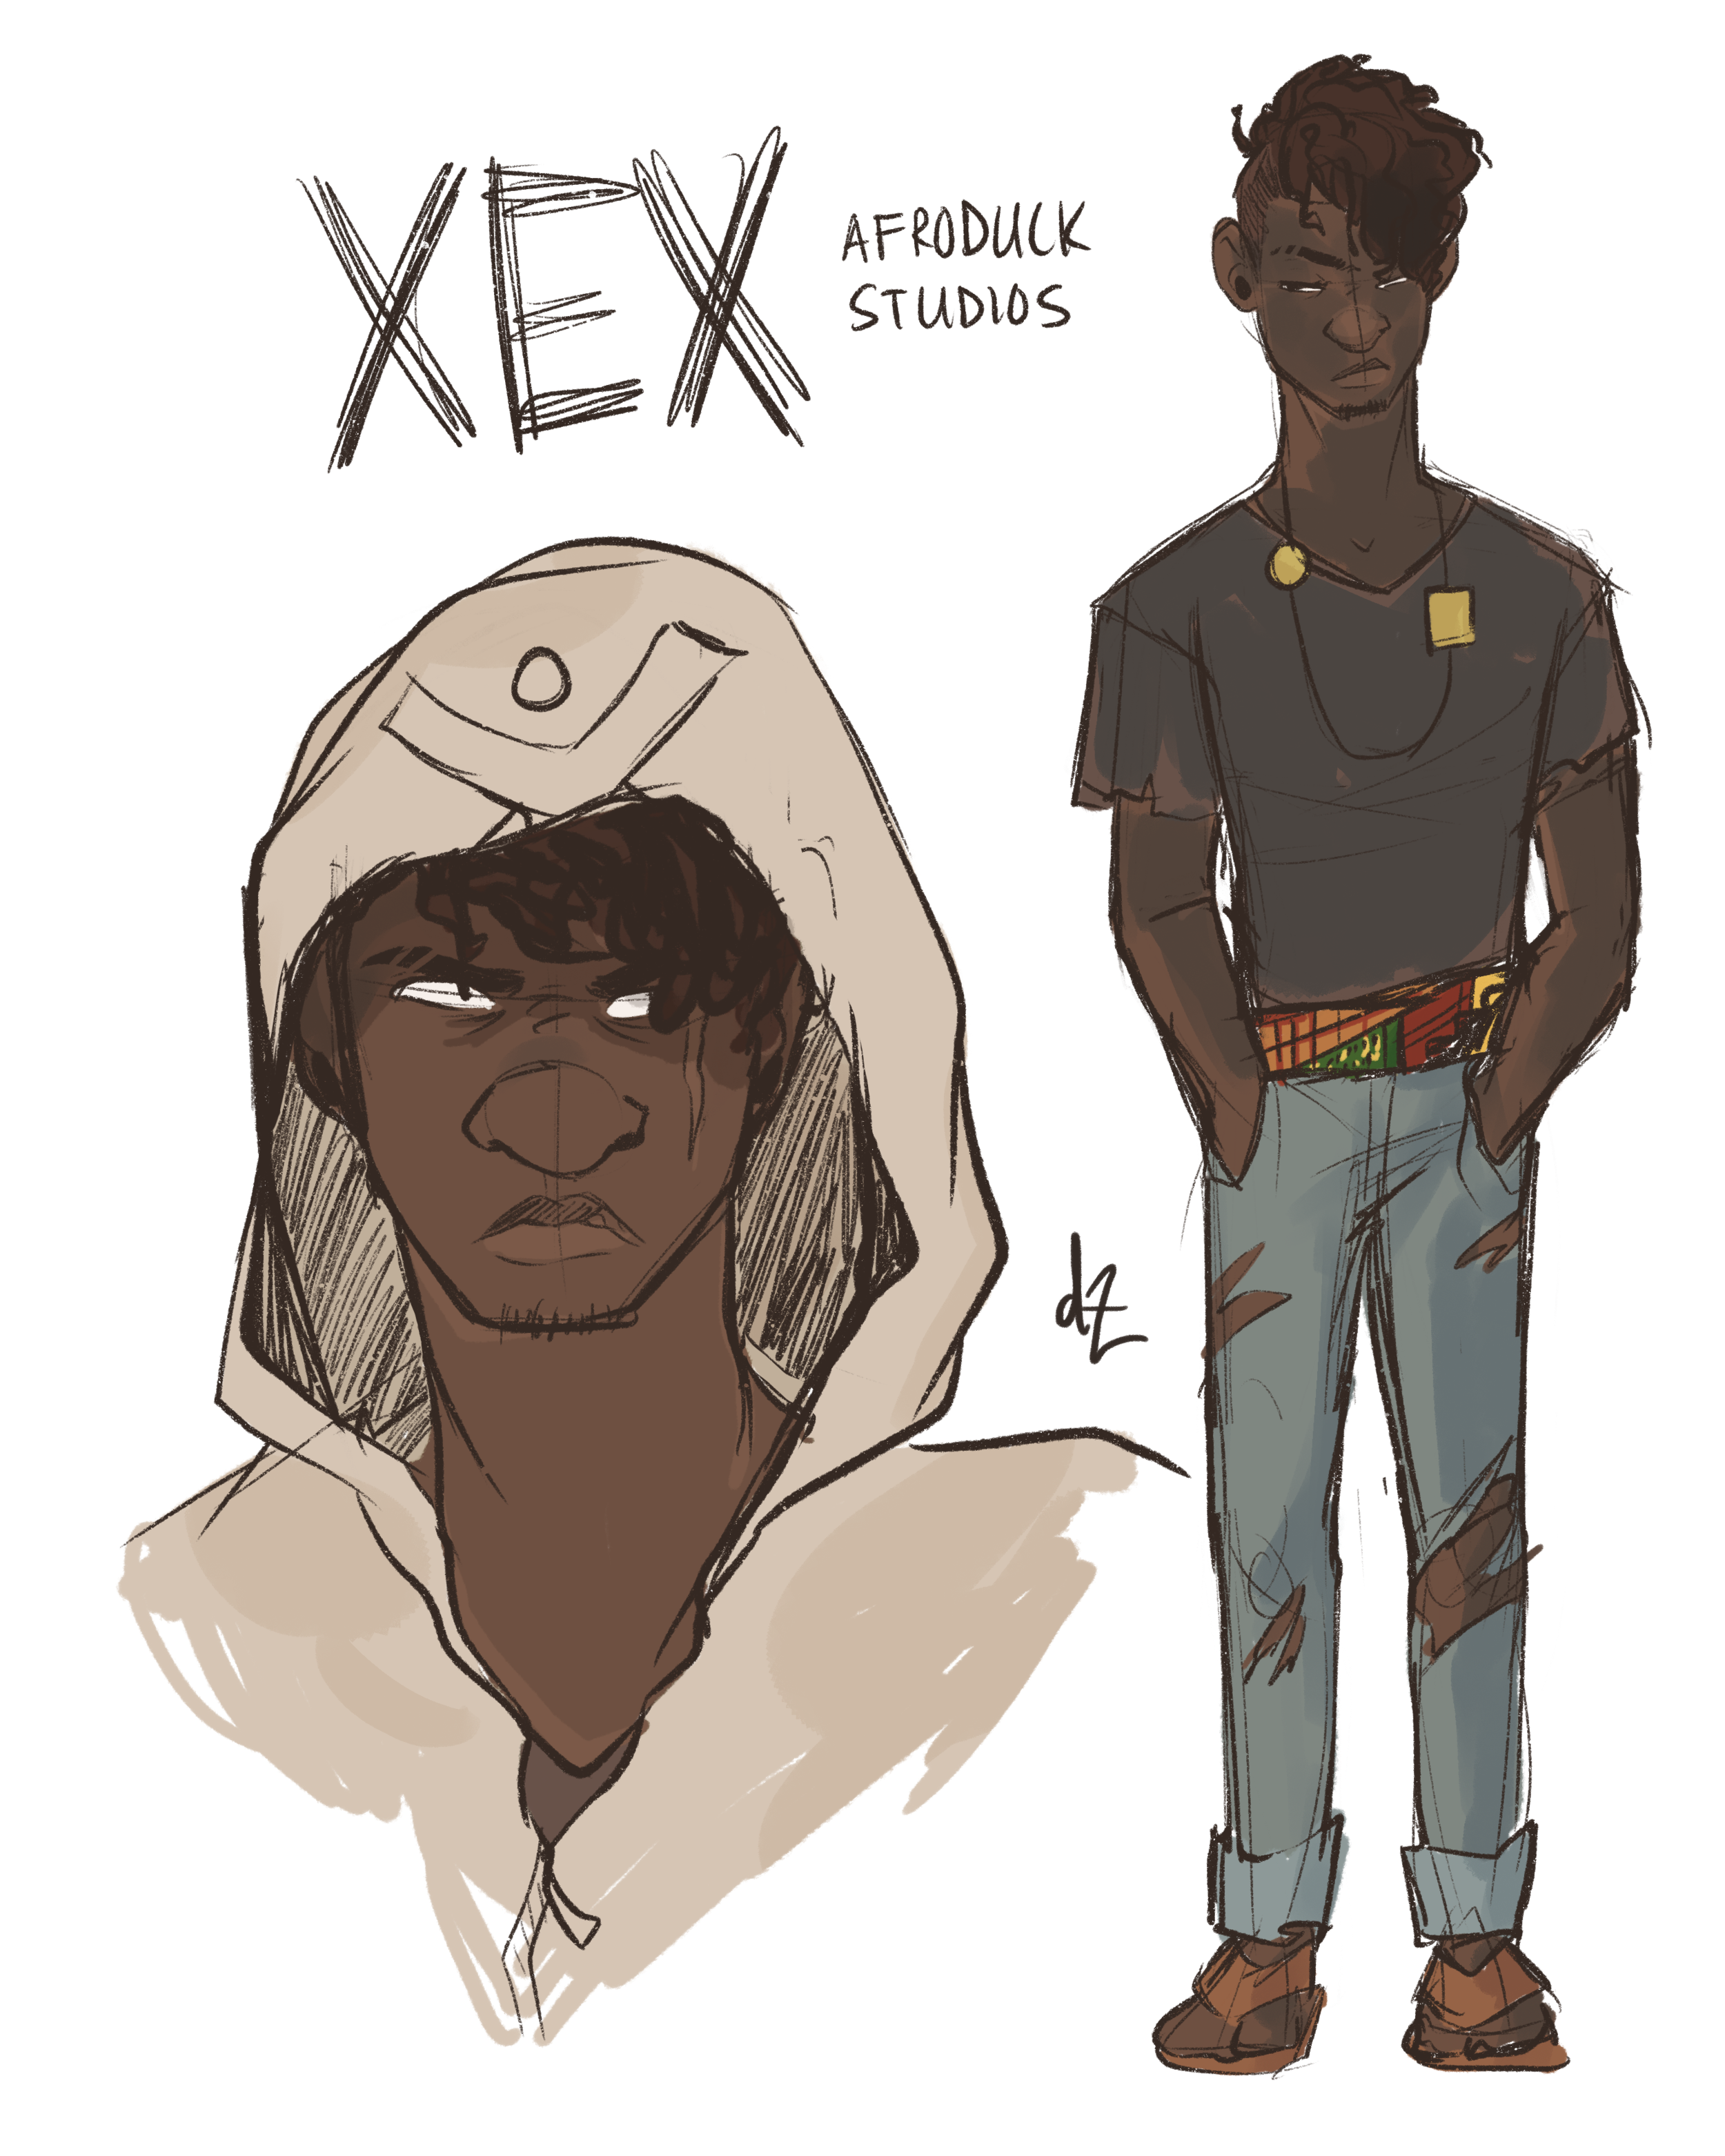 Xex Design (Yayira Diaz)